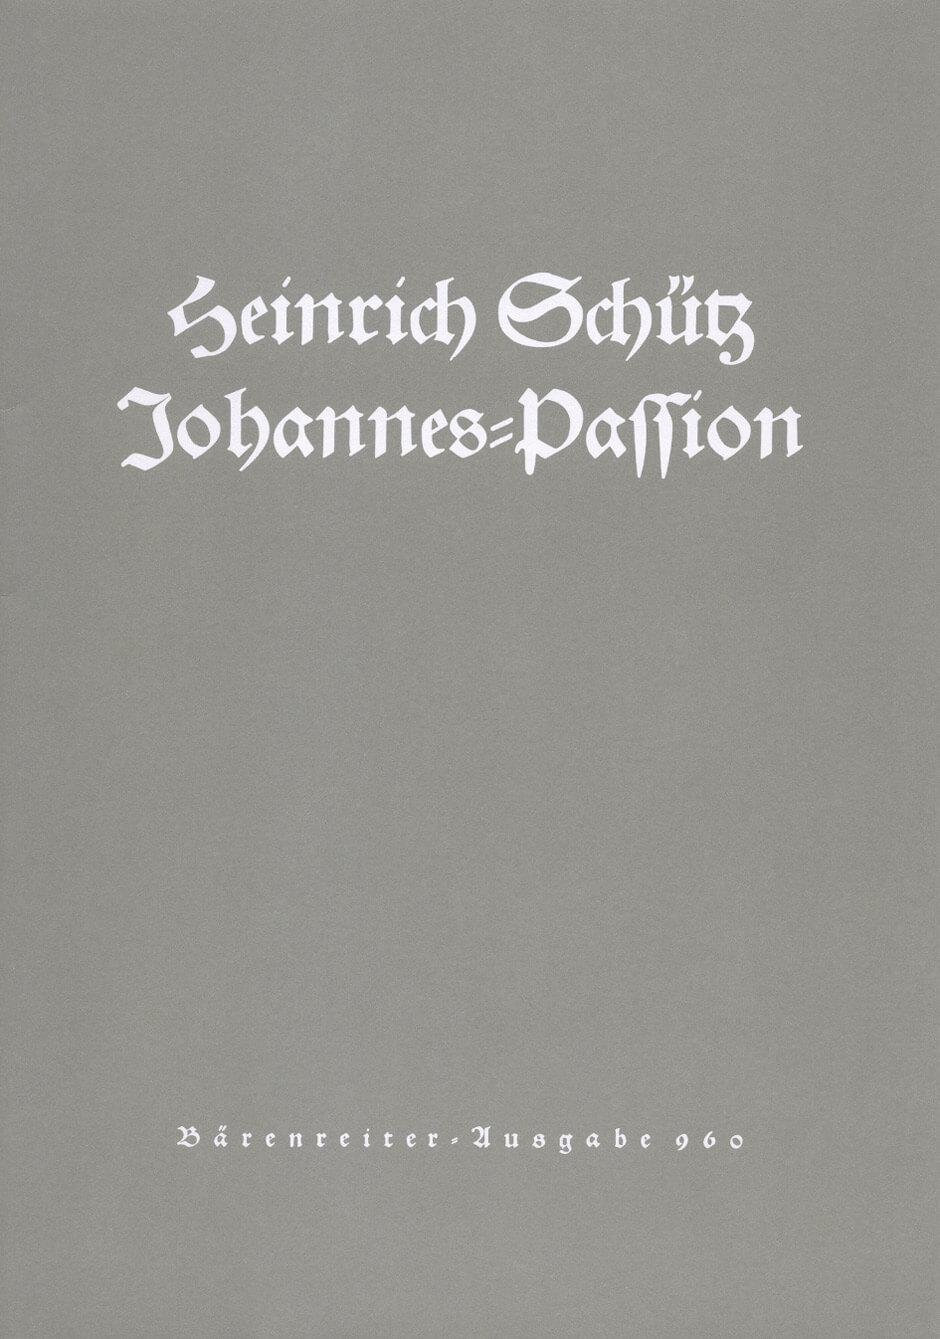 Johannes-Passion SWV 481. Schutz